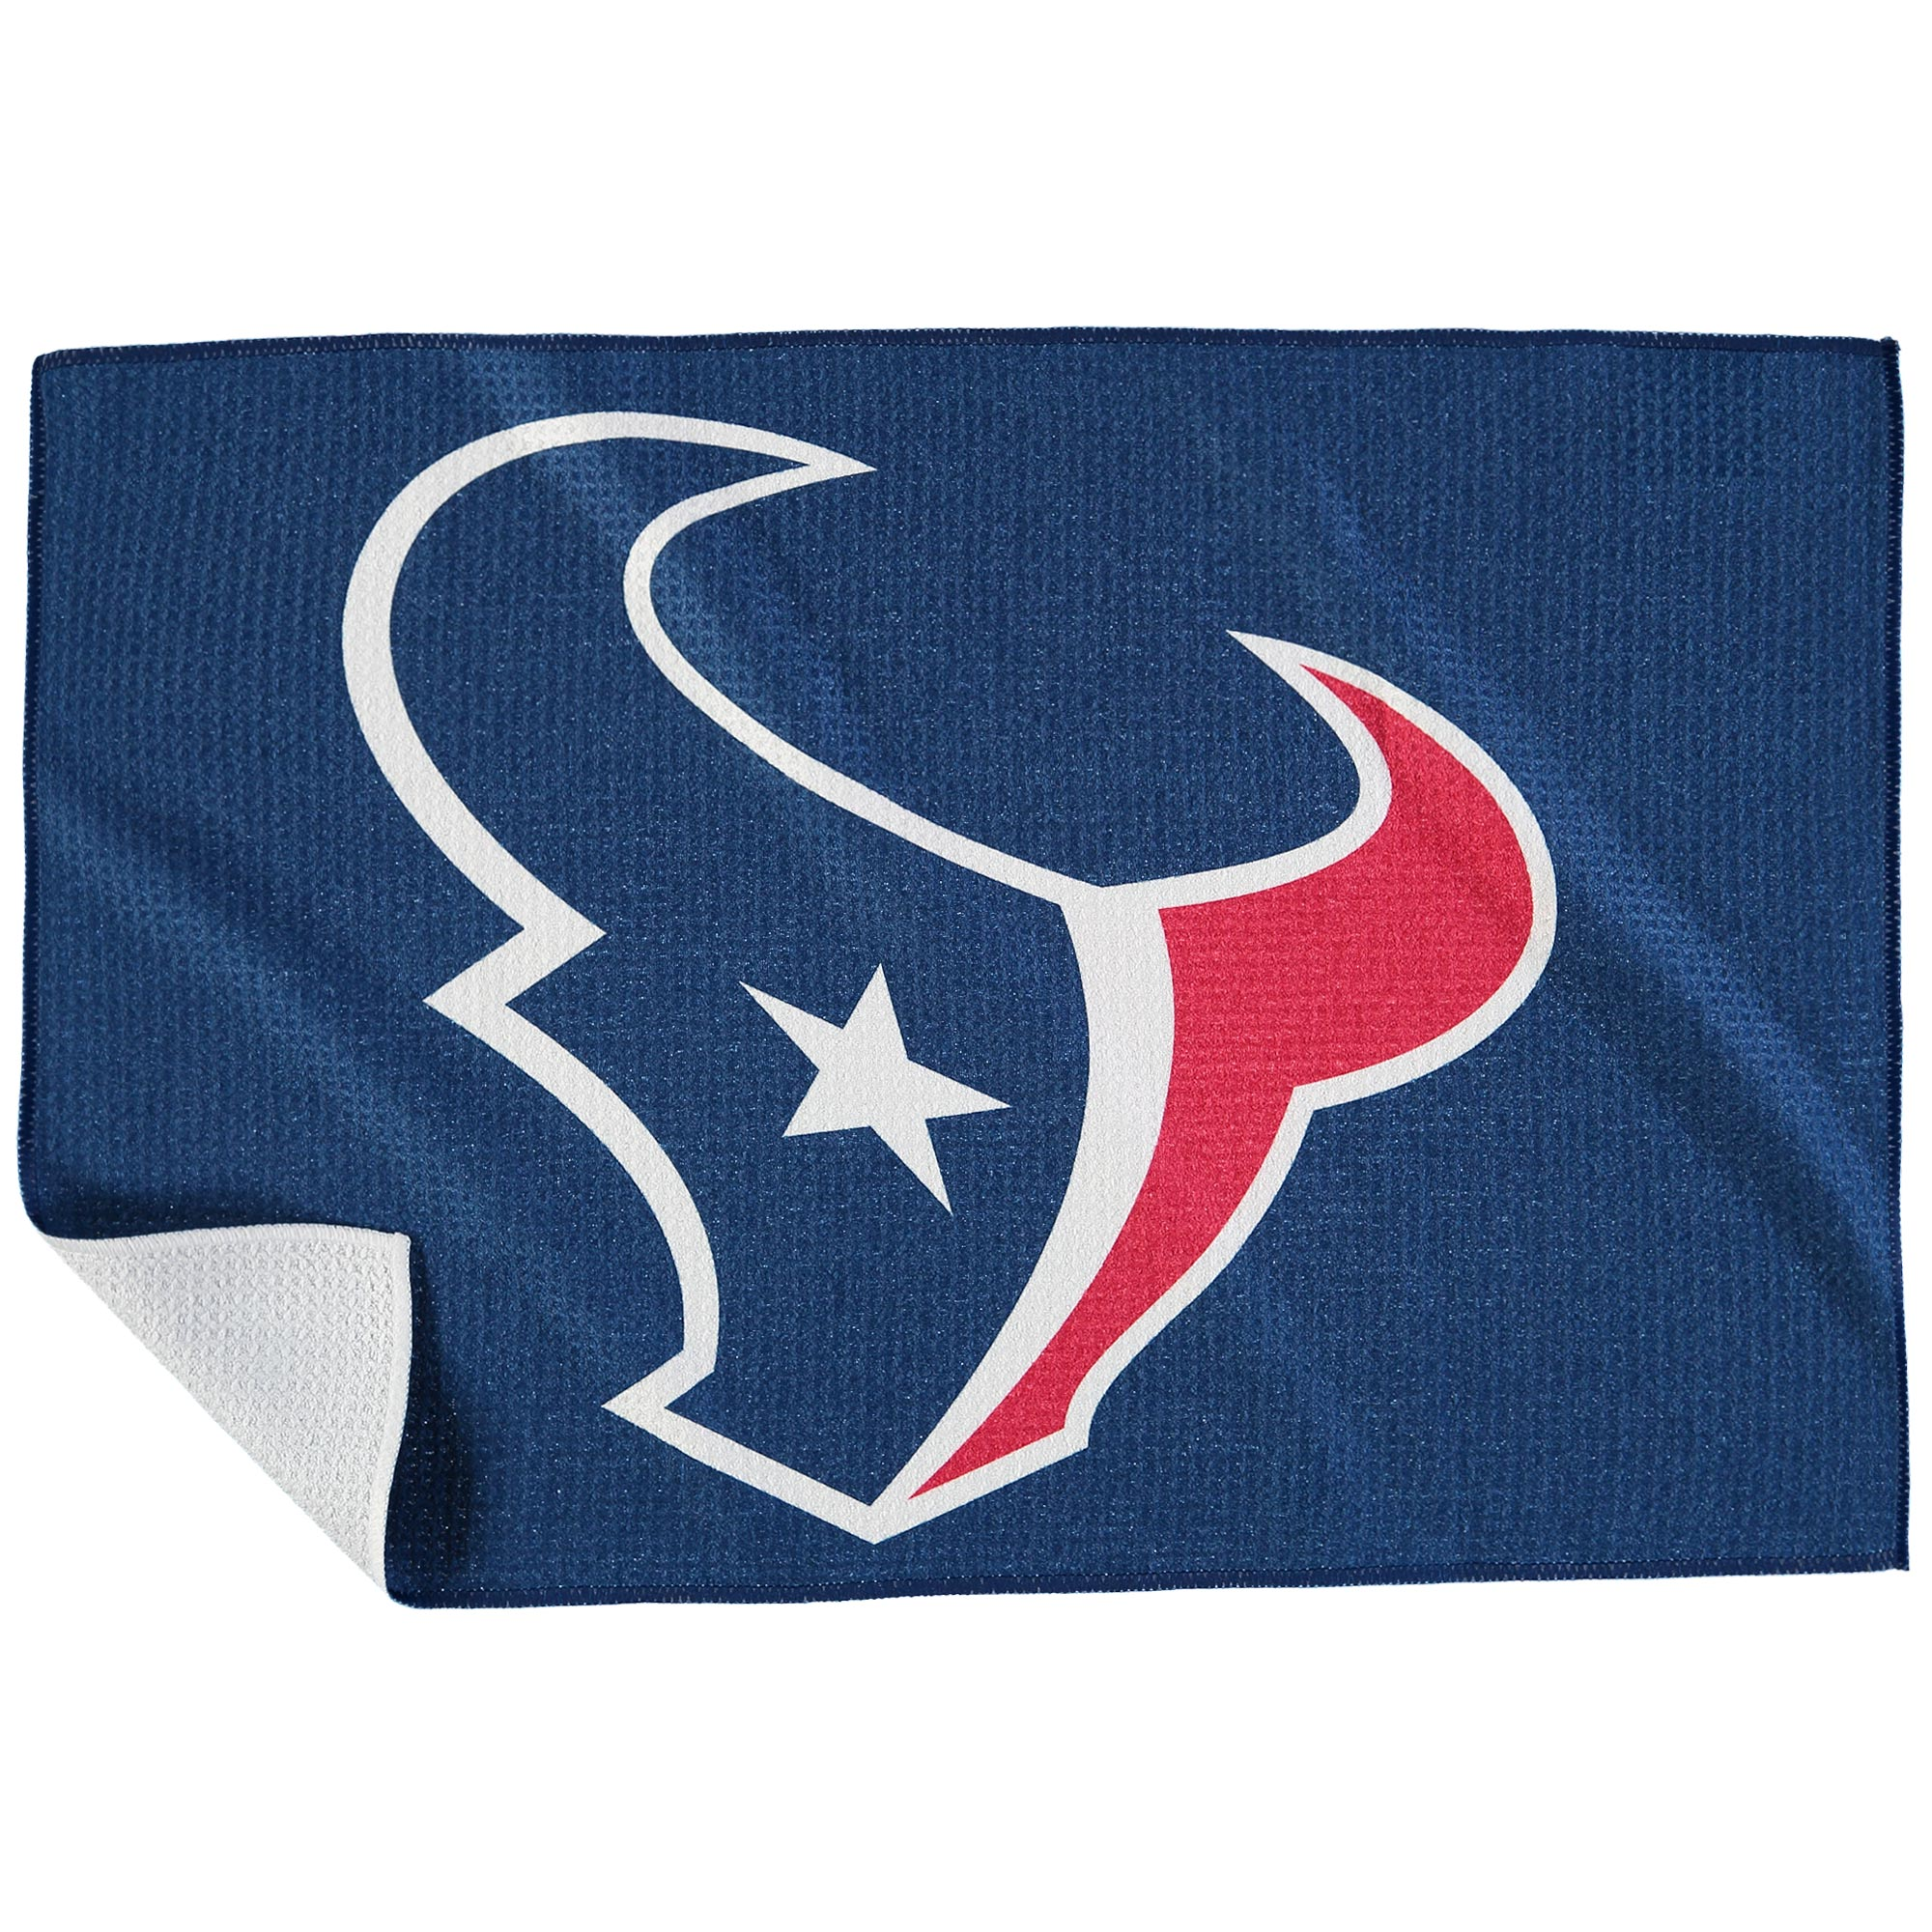 "Houston Texans 16"" x 24"" Microfiber Towel"